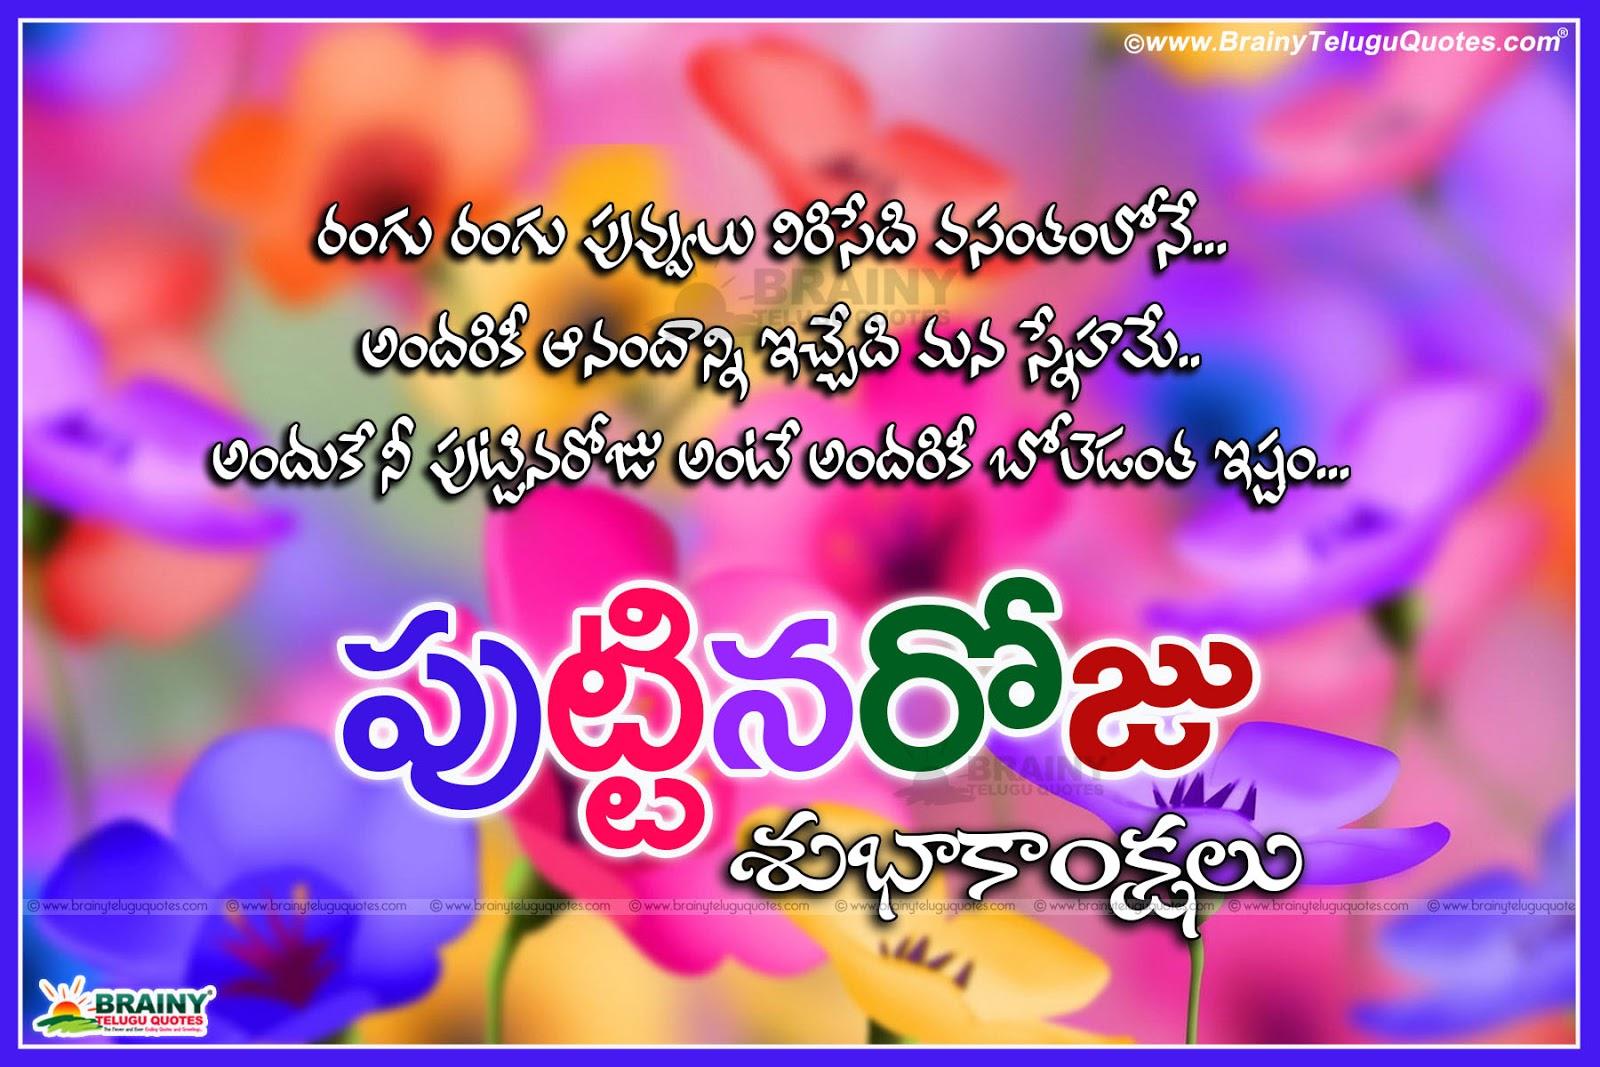 Vinayaka Chavithi Hd Wallpapers Birthday Quotations Kavithalu In Telugu With Images